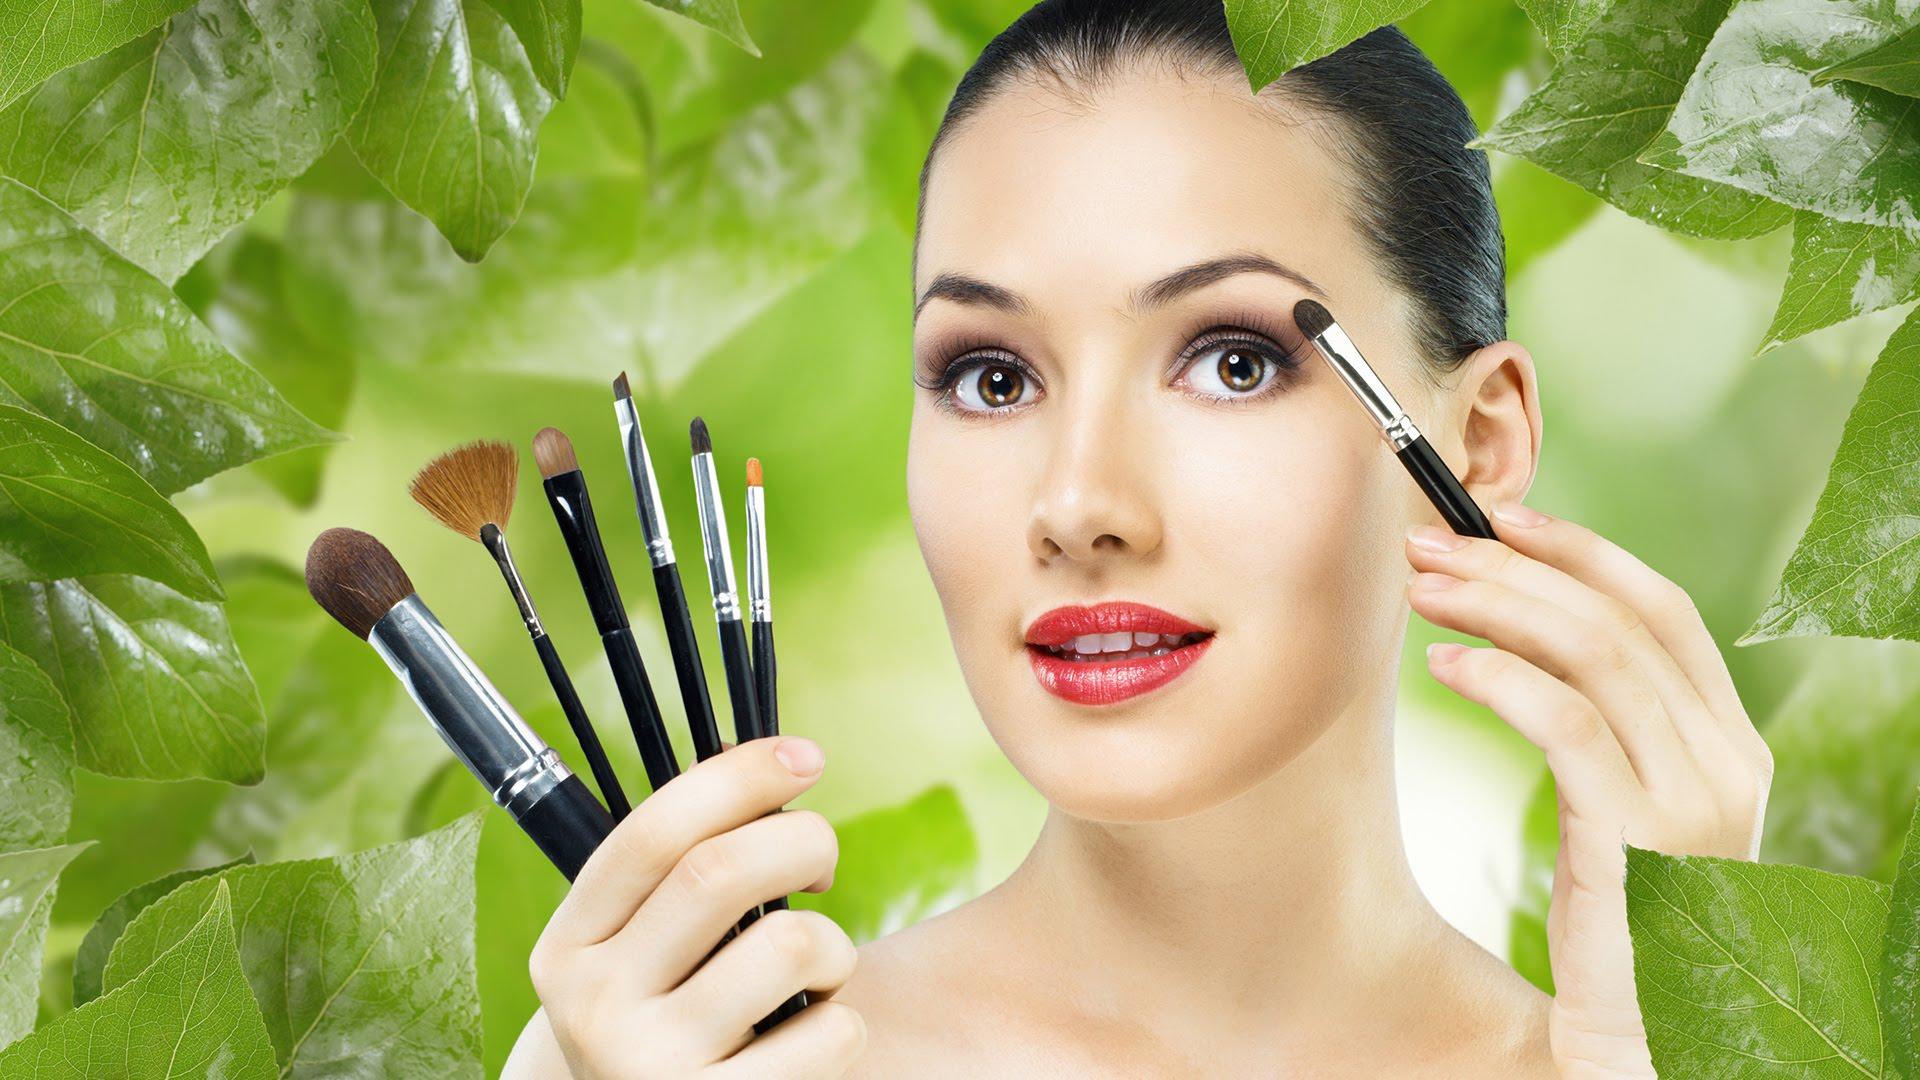 Wash your make up brushes regularly